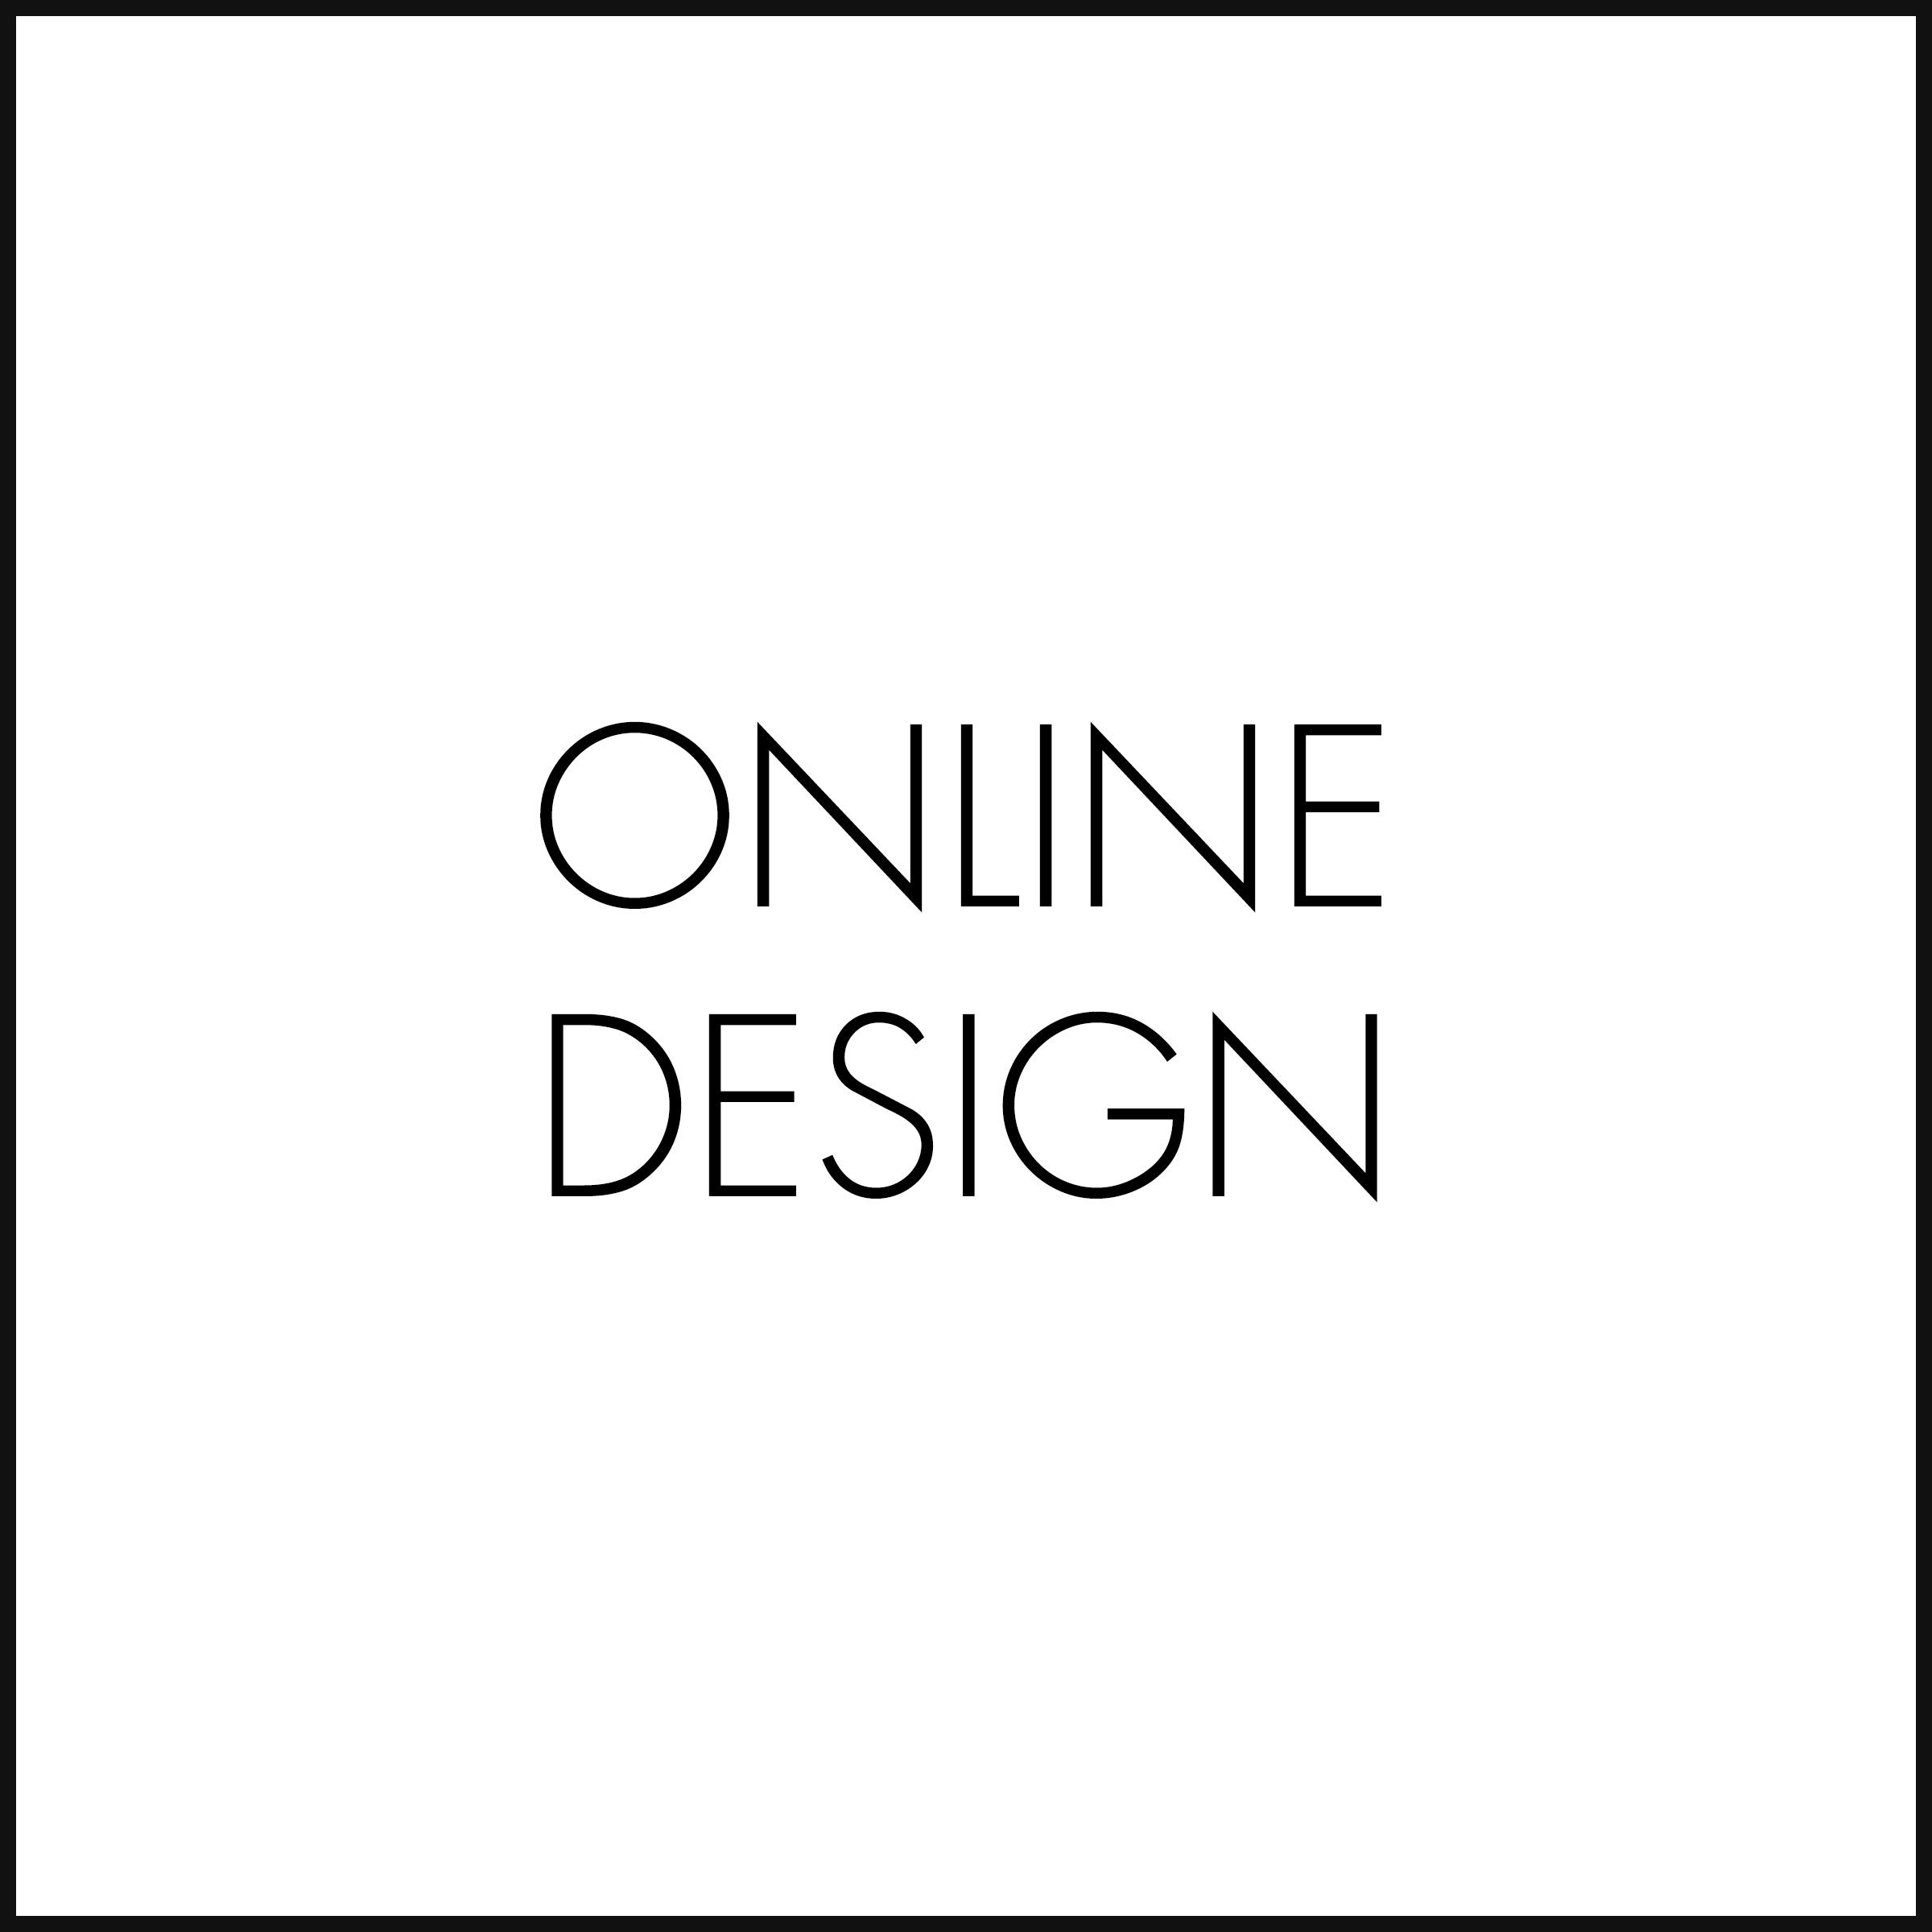 BOX - Online Design.jpg